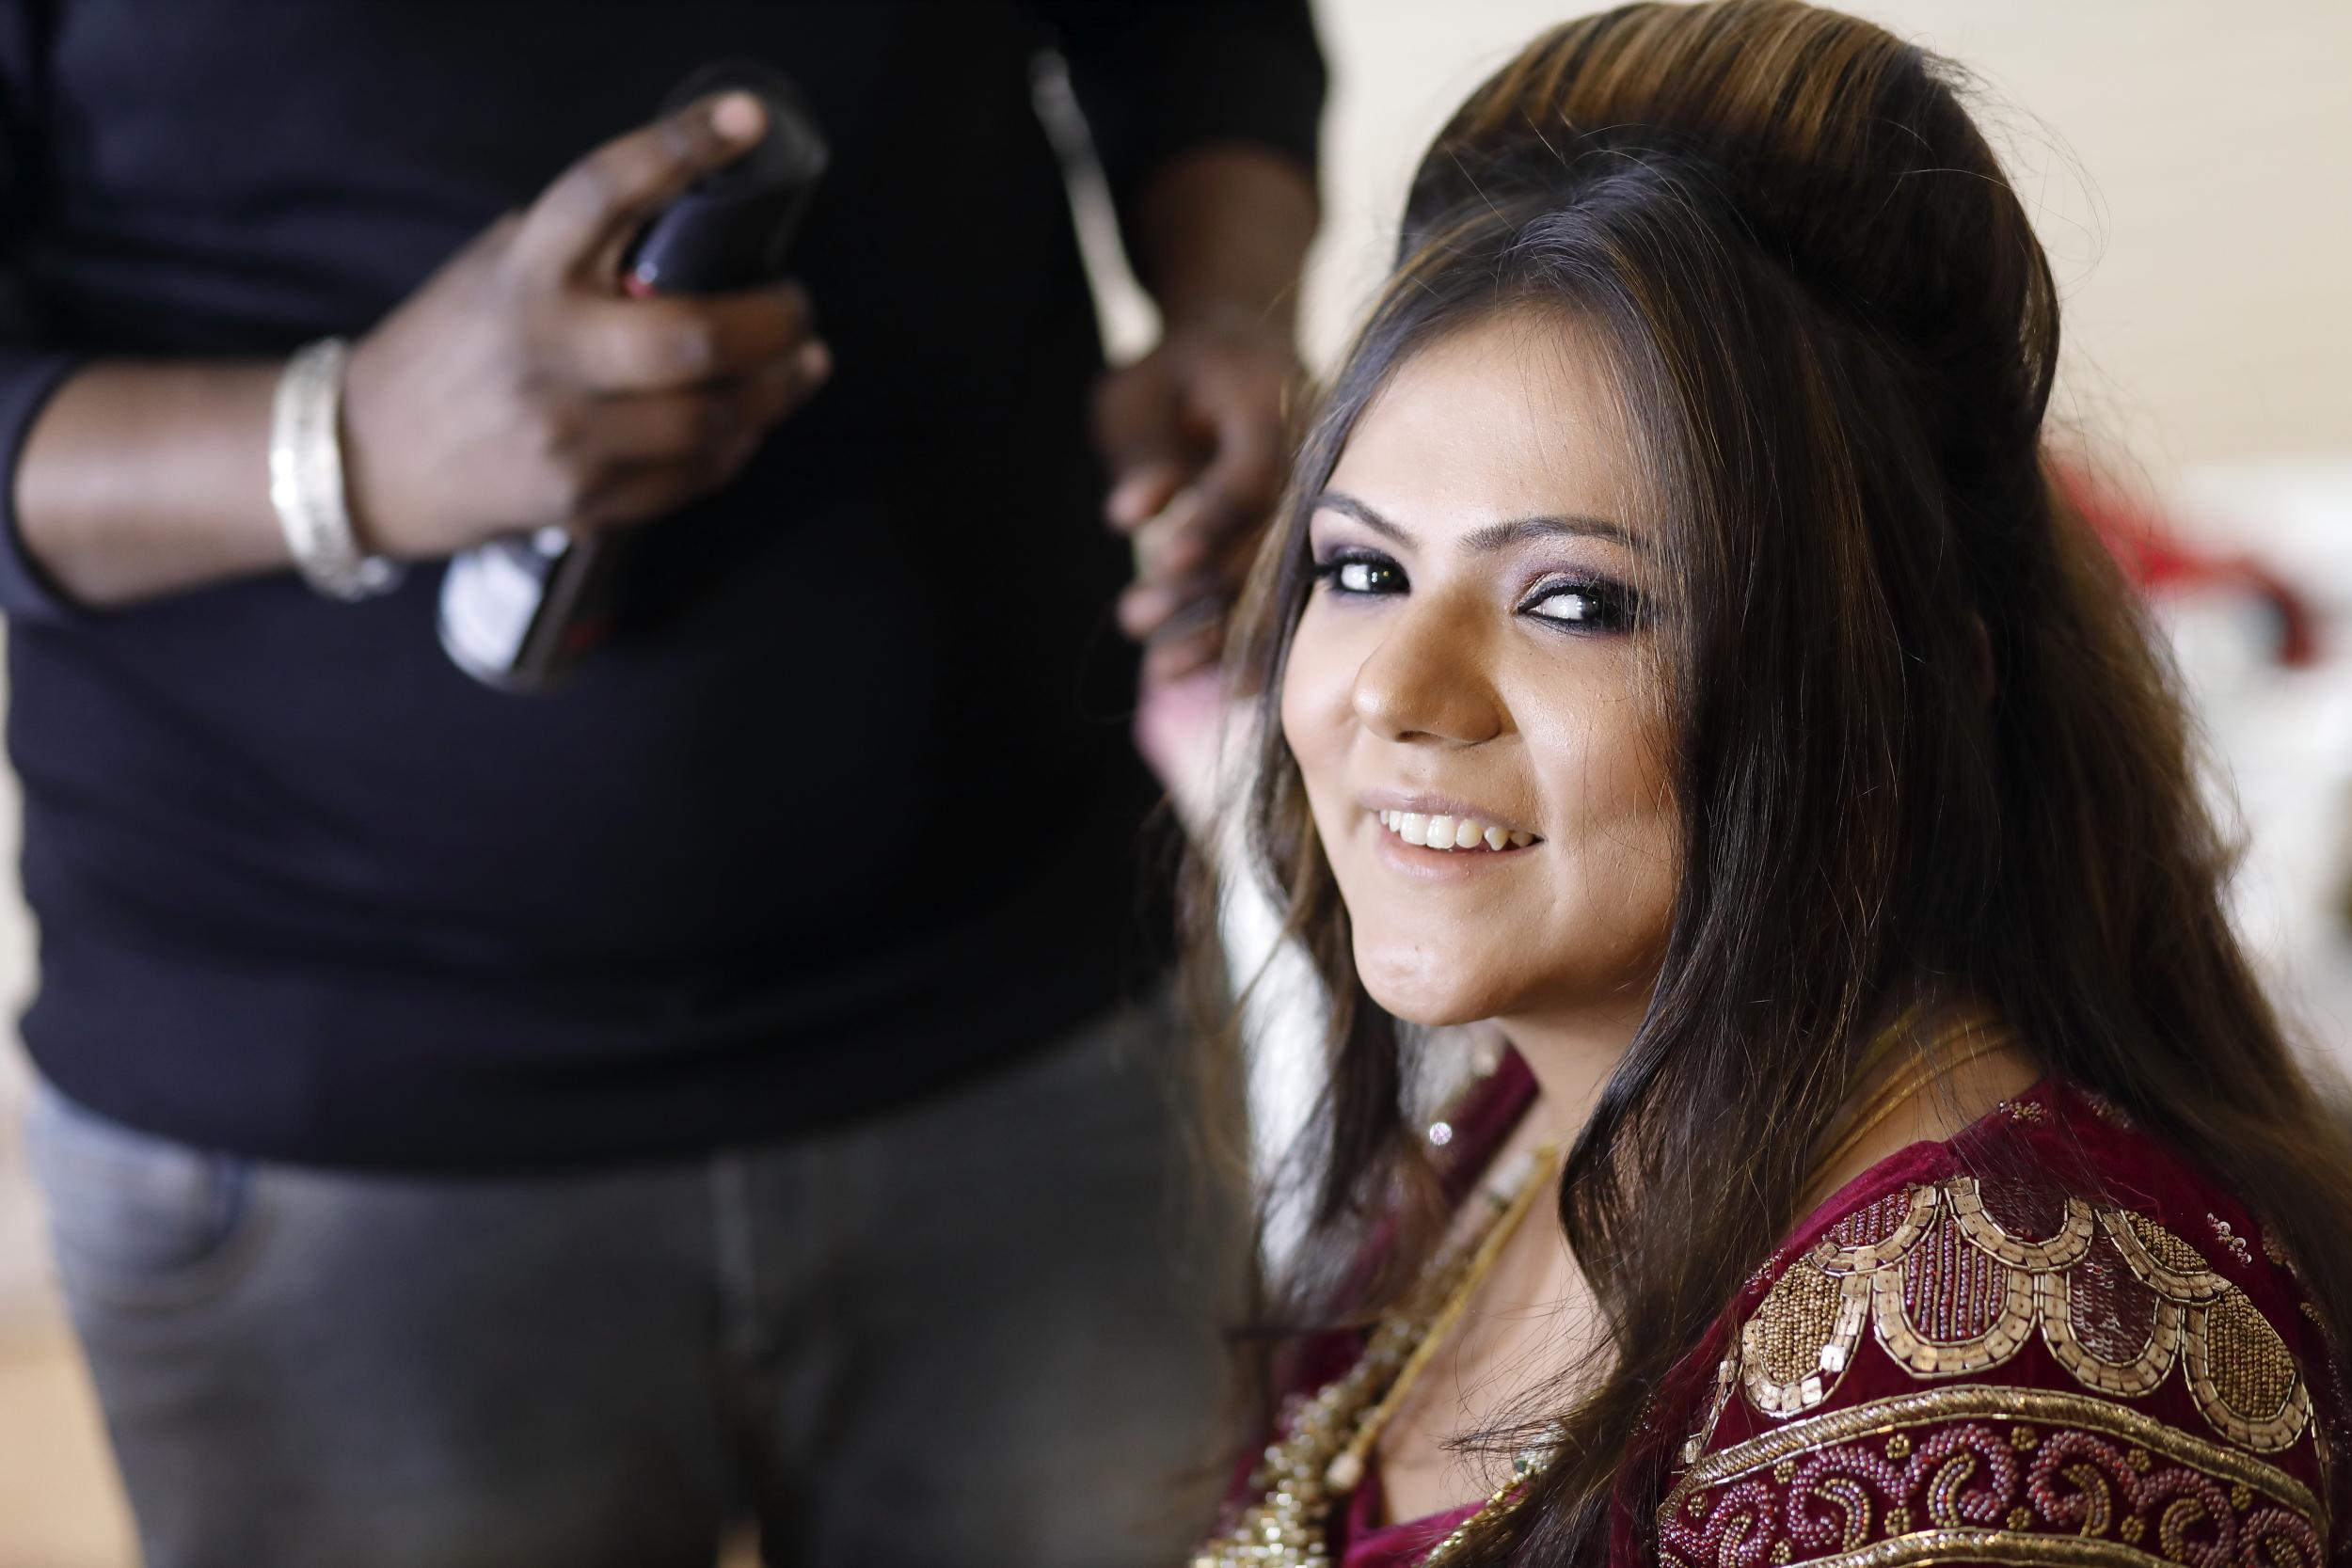 Candid wedding photographersC69A0500 Delhi